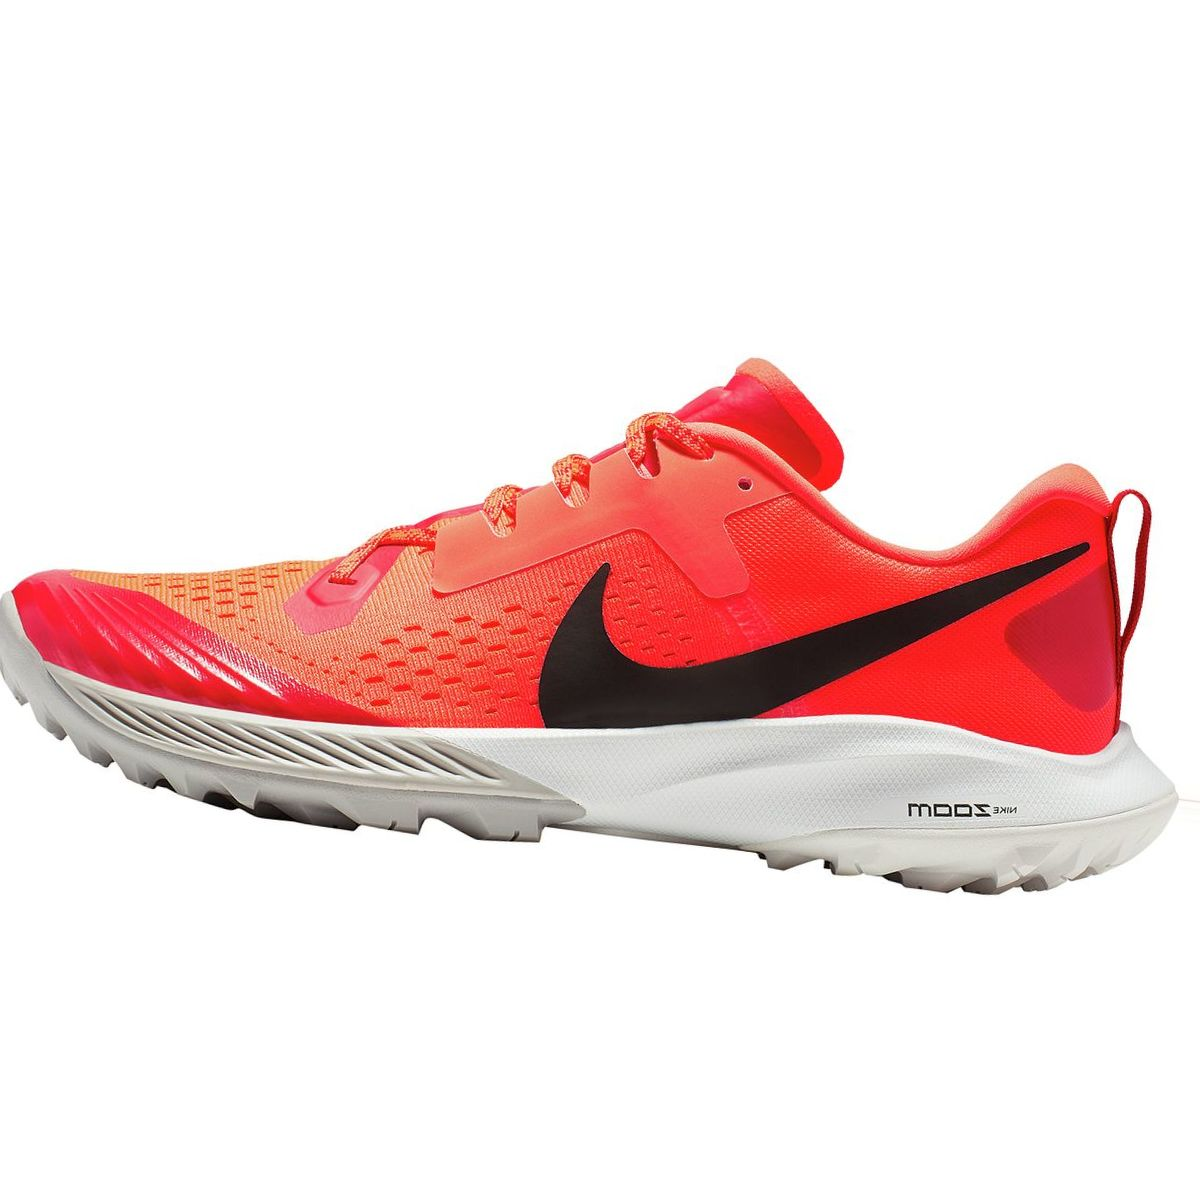 Nike Air Zoom Terra Kiger 5 Trail Running Shoe - Men's